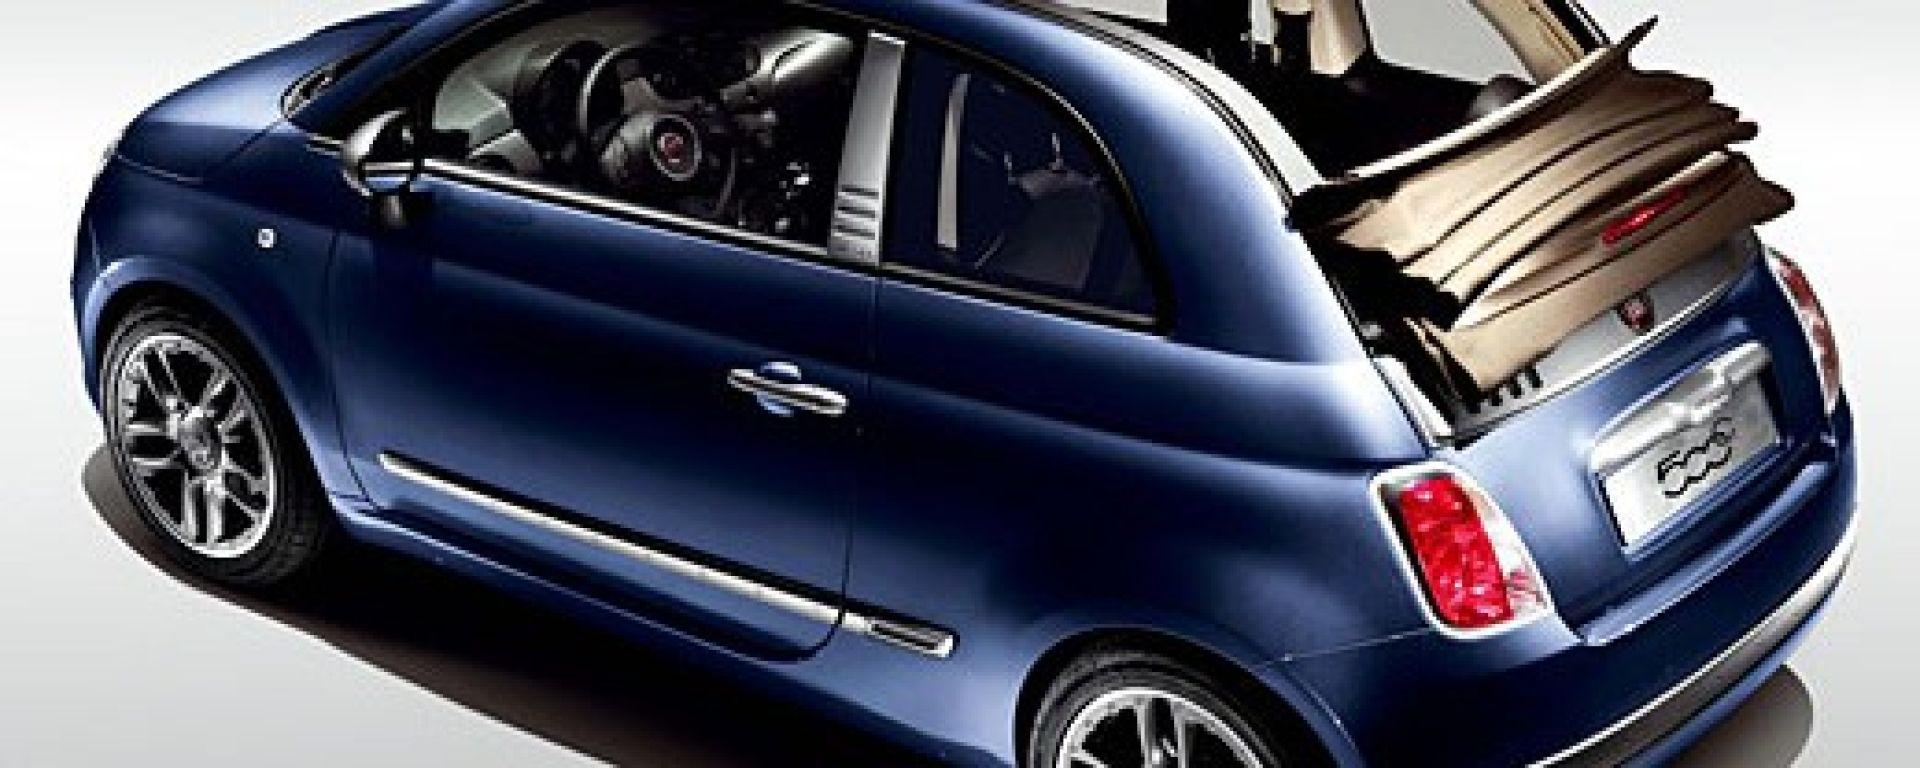 Fiat 500 C by Diesel